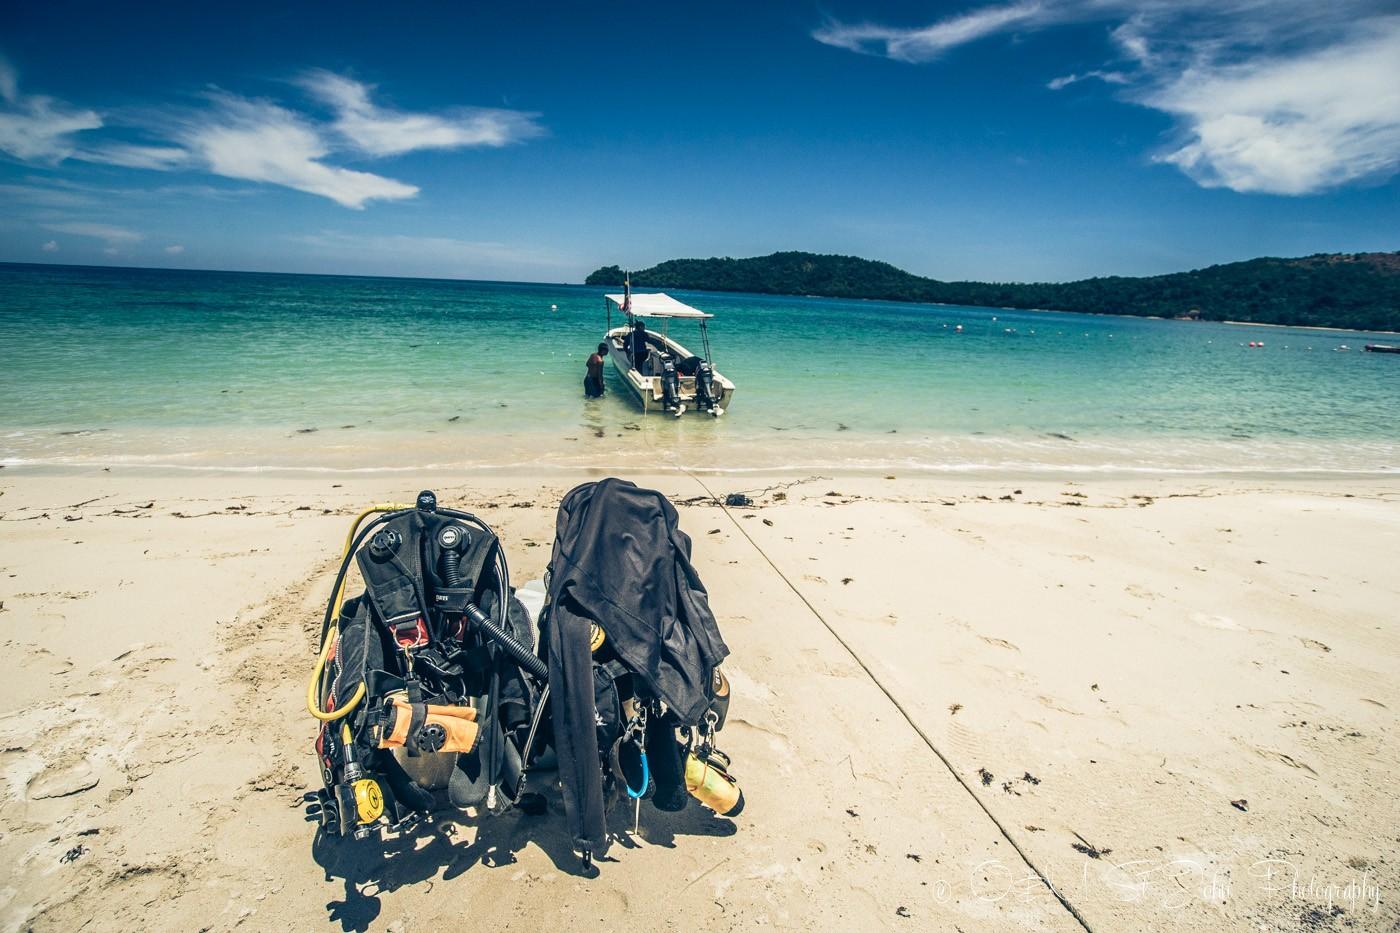 Diving at Bigfin Divers in Mañana Borneo Resort. Sabah. Malaysia